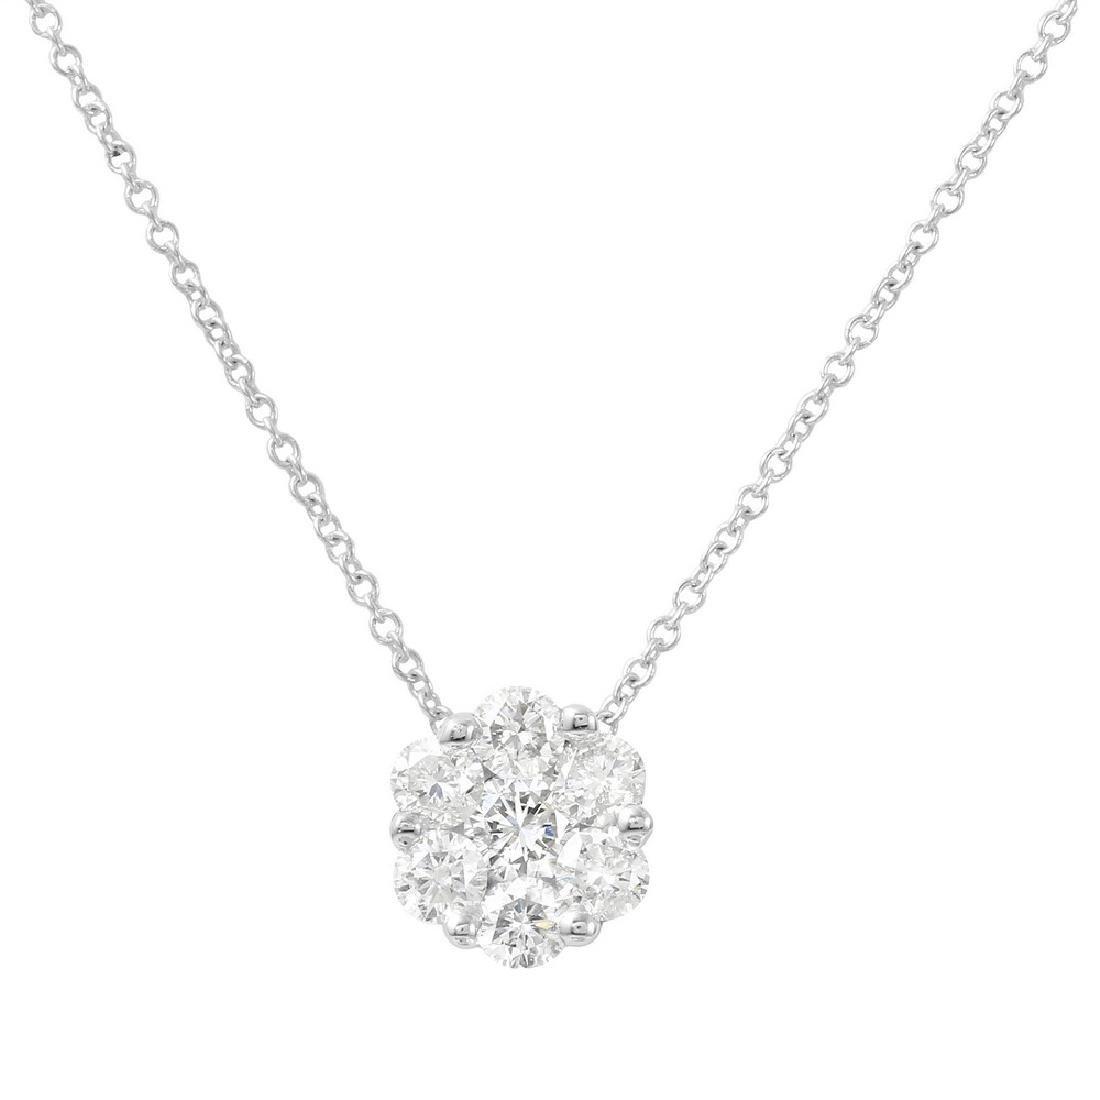 Genuine 0.75 TCW 14K White Gold Ladies Pendant